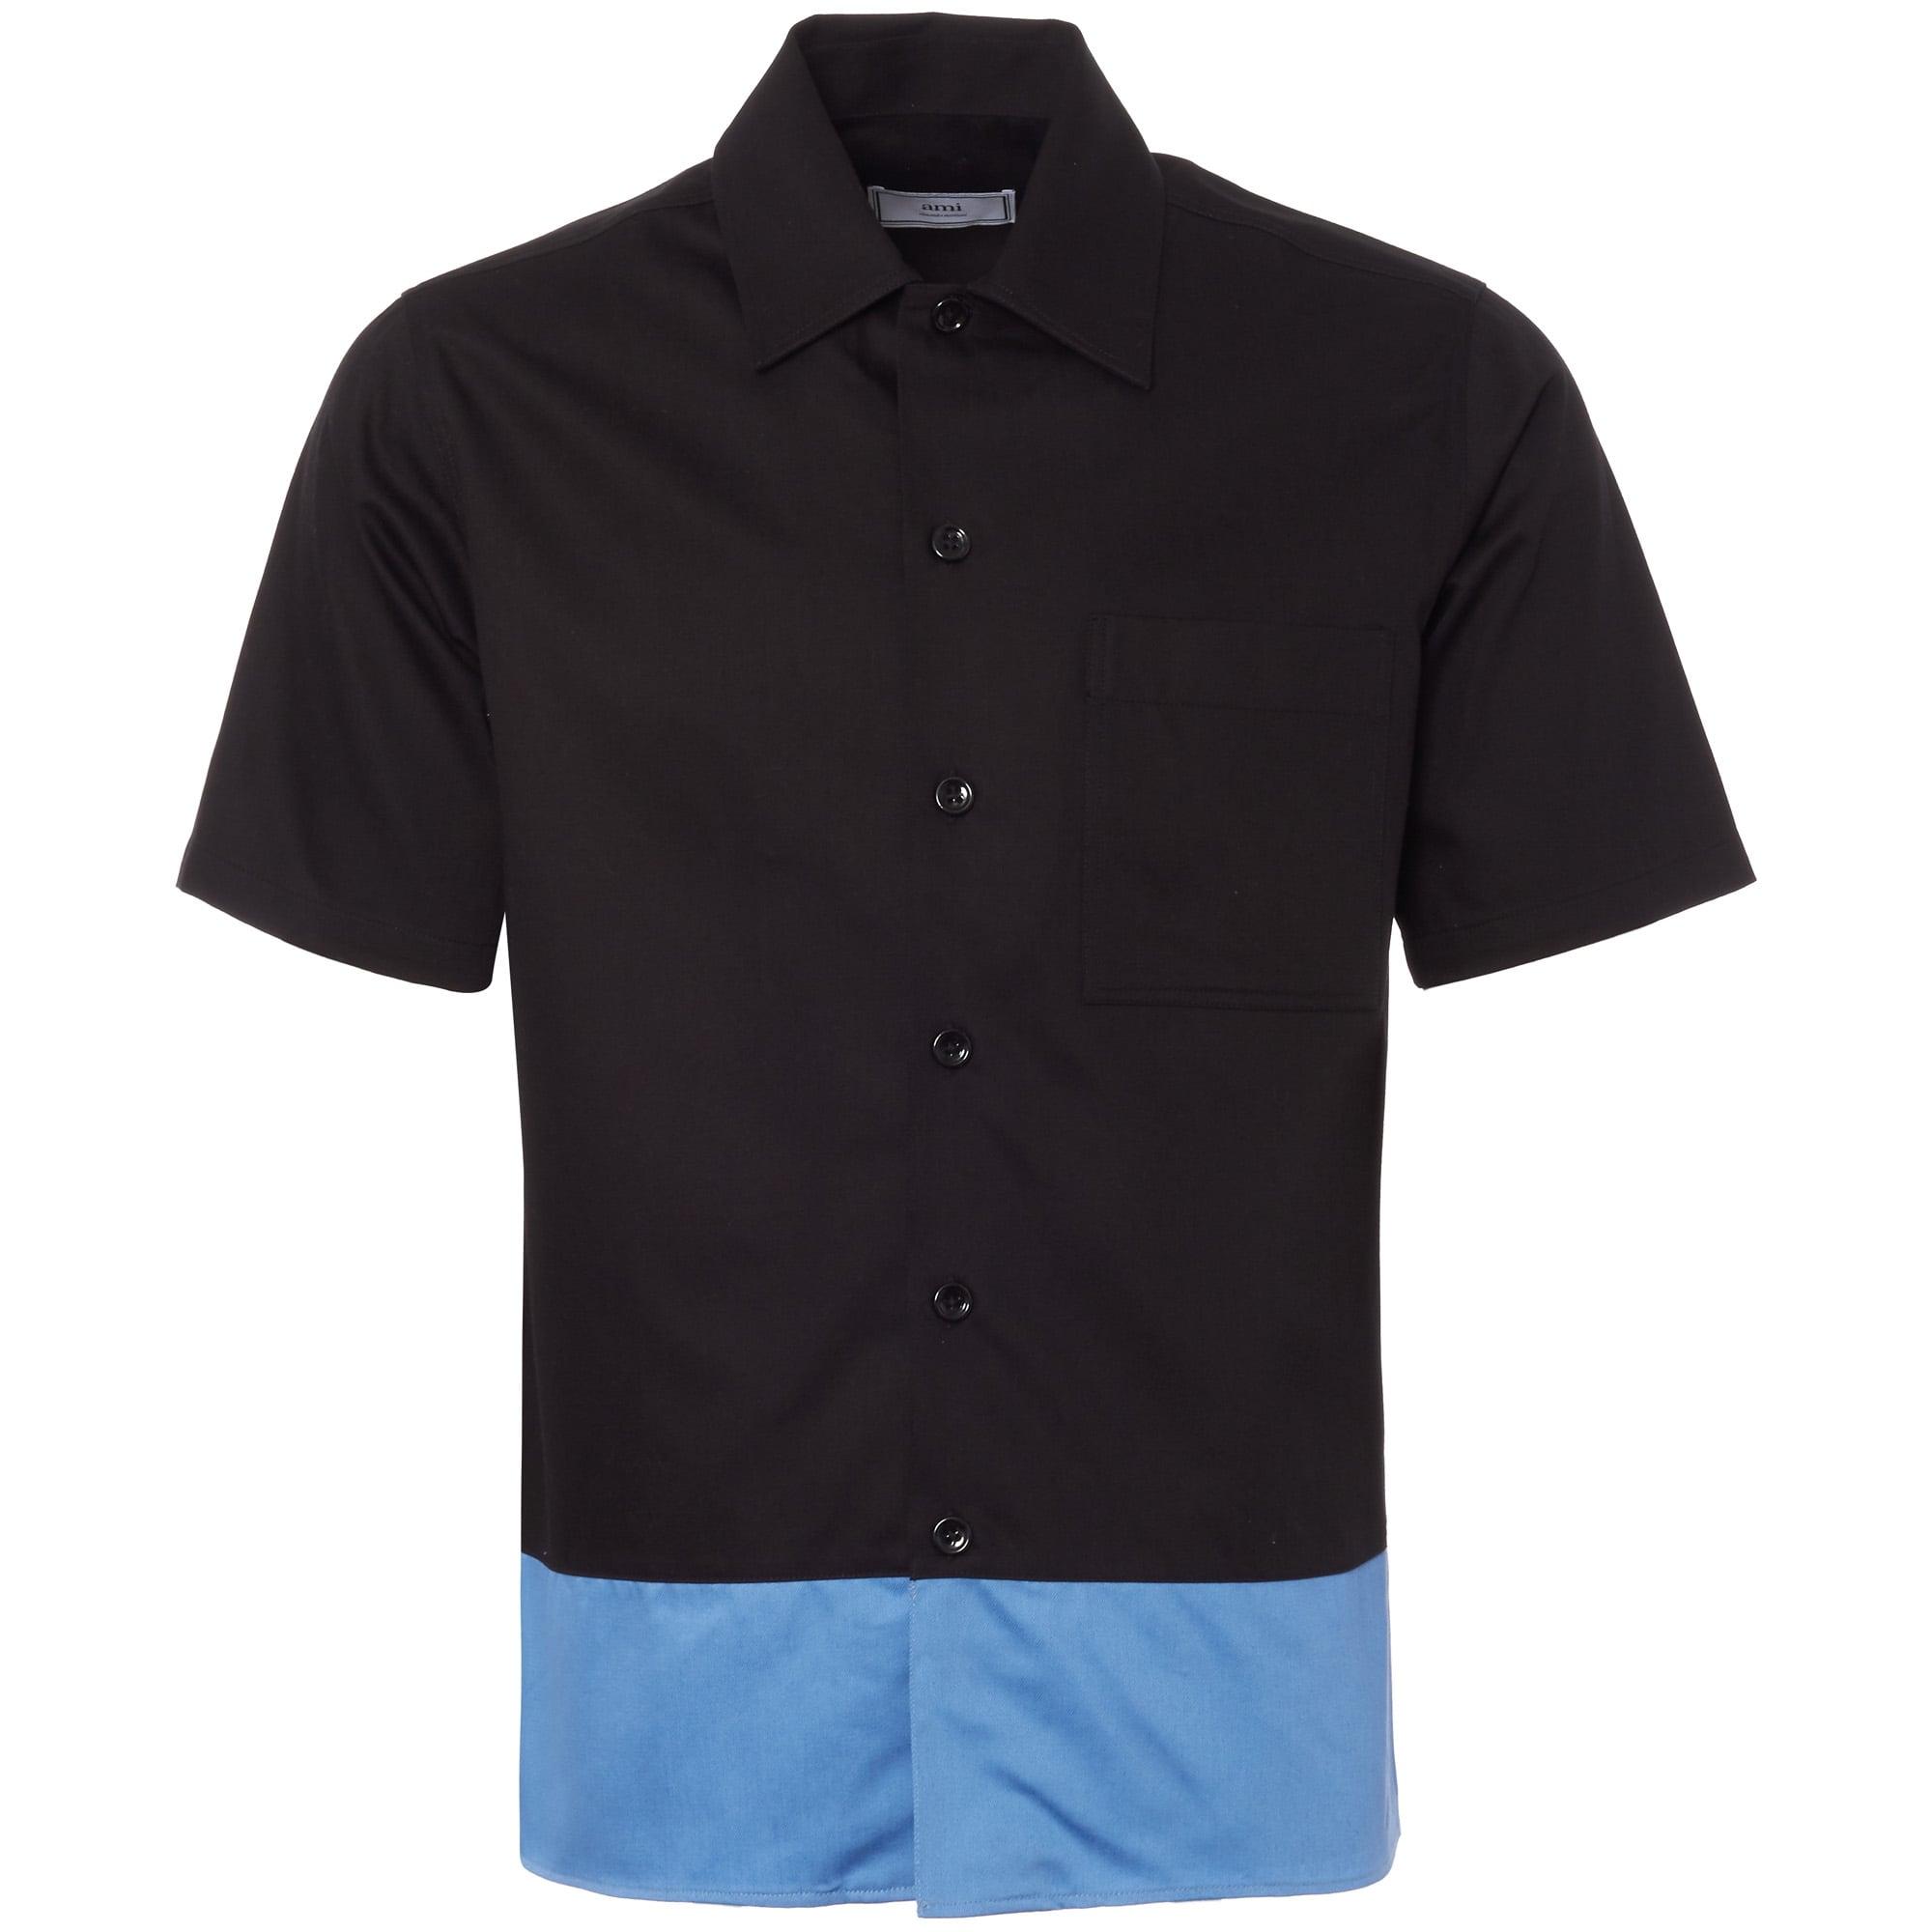 Black Contrast Short Sleeve Shirt